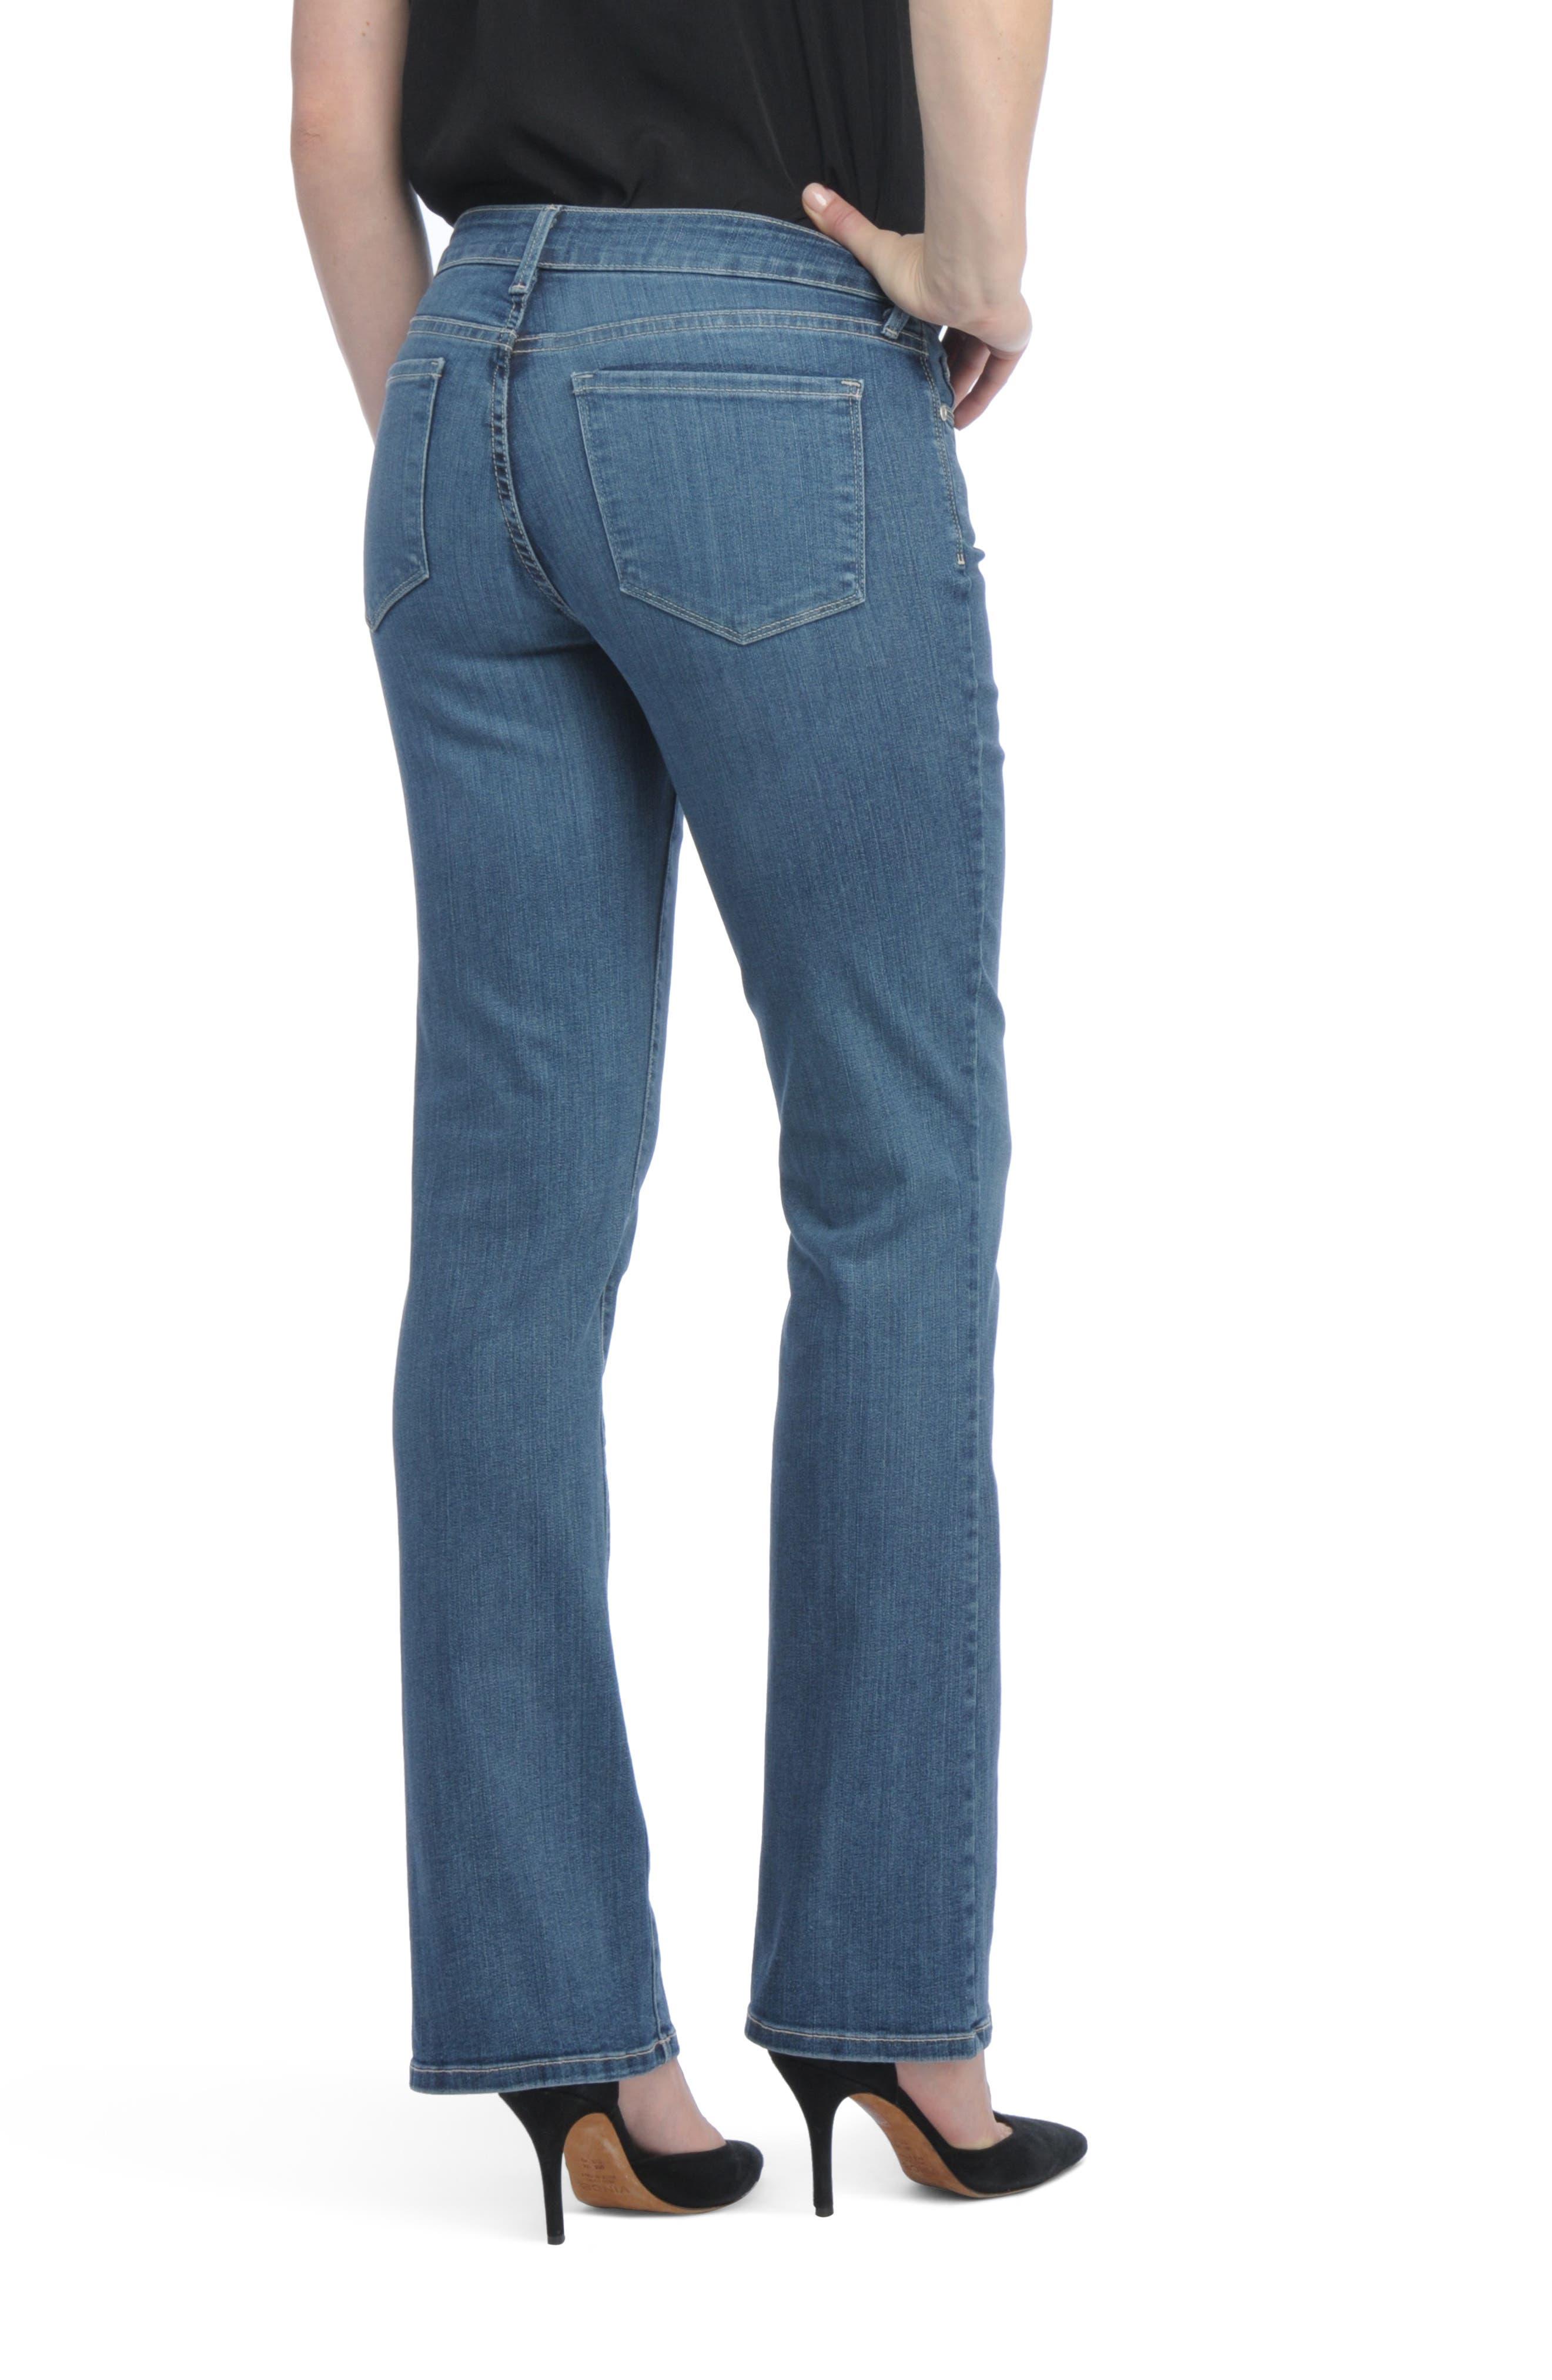 Barbara Bootcut Short Jeans,                             Alternate thumbnail 2, color,